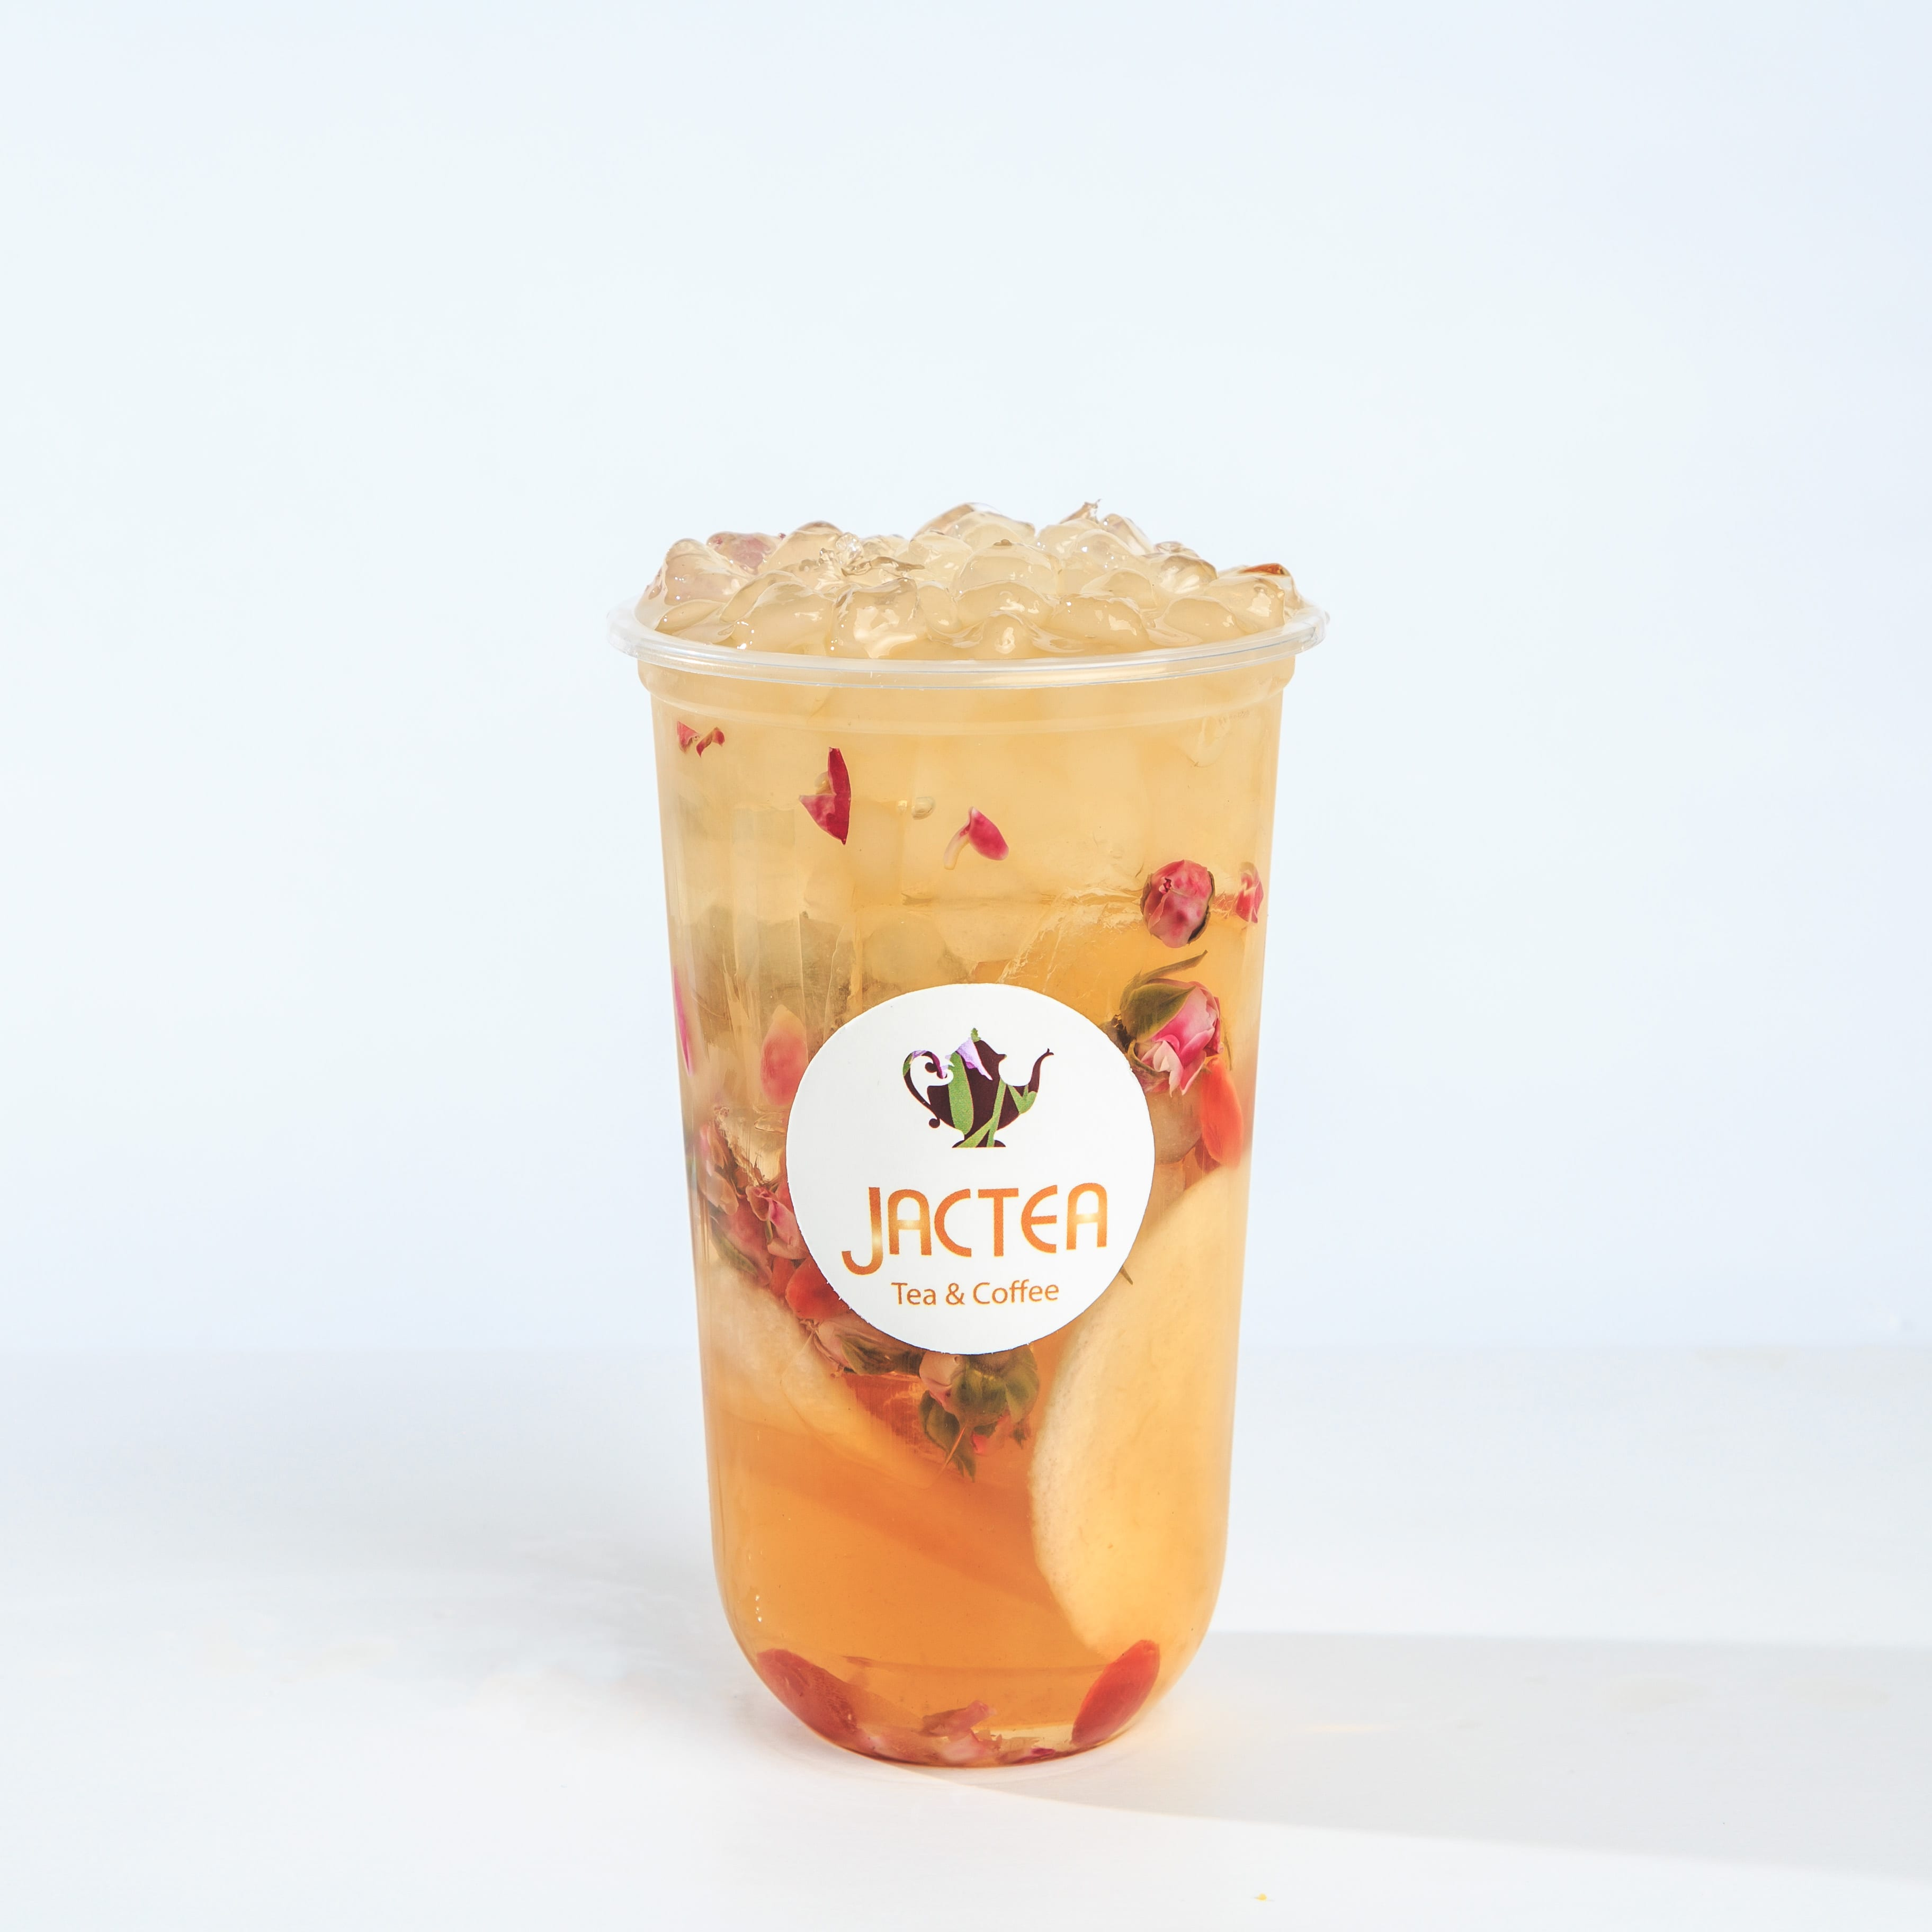 Trà hoa hồng tươi mát Jactea